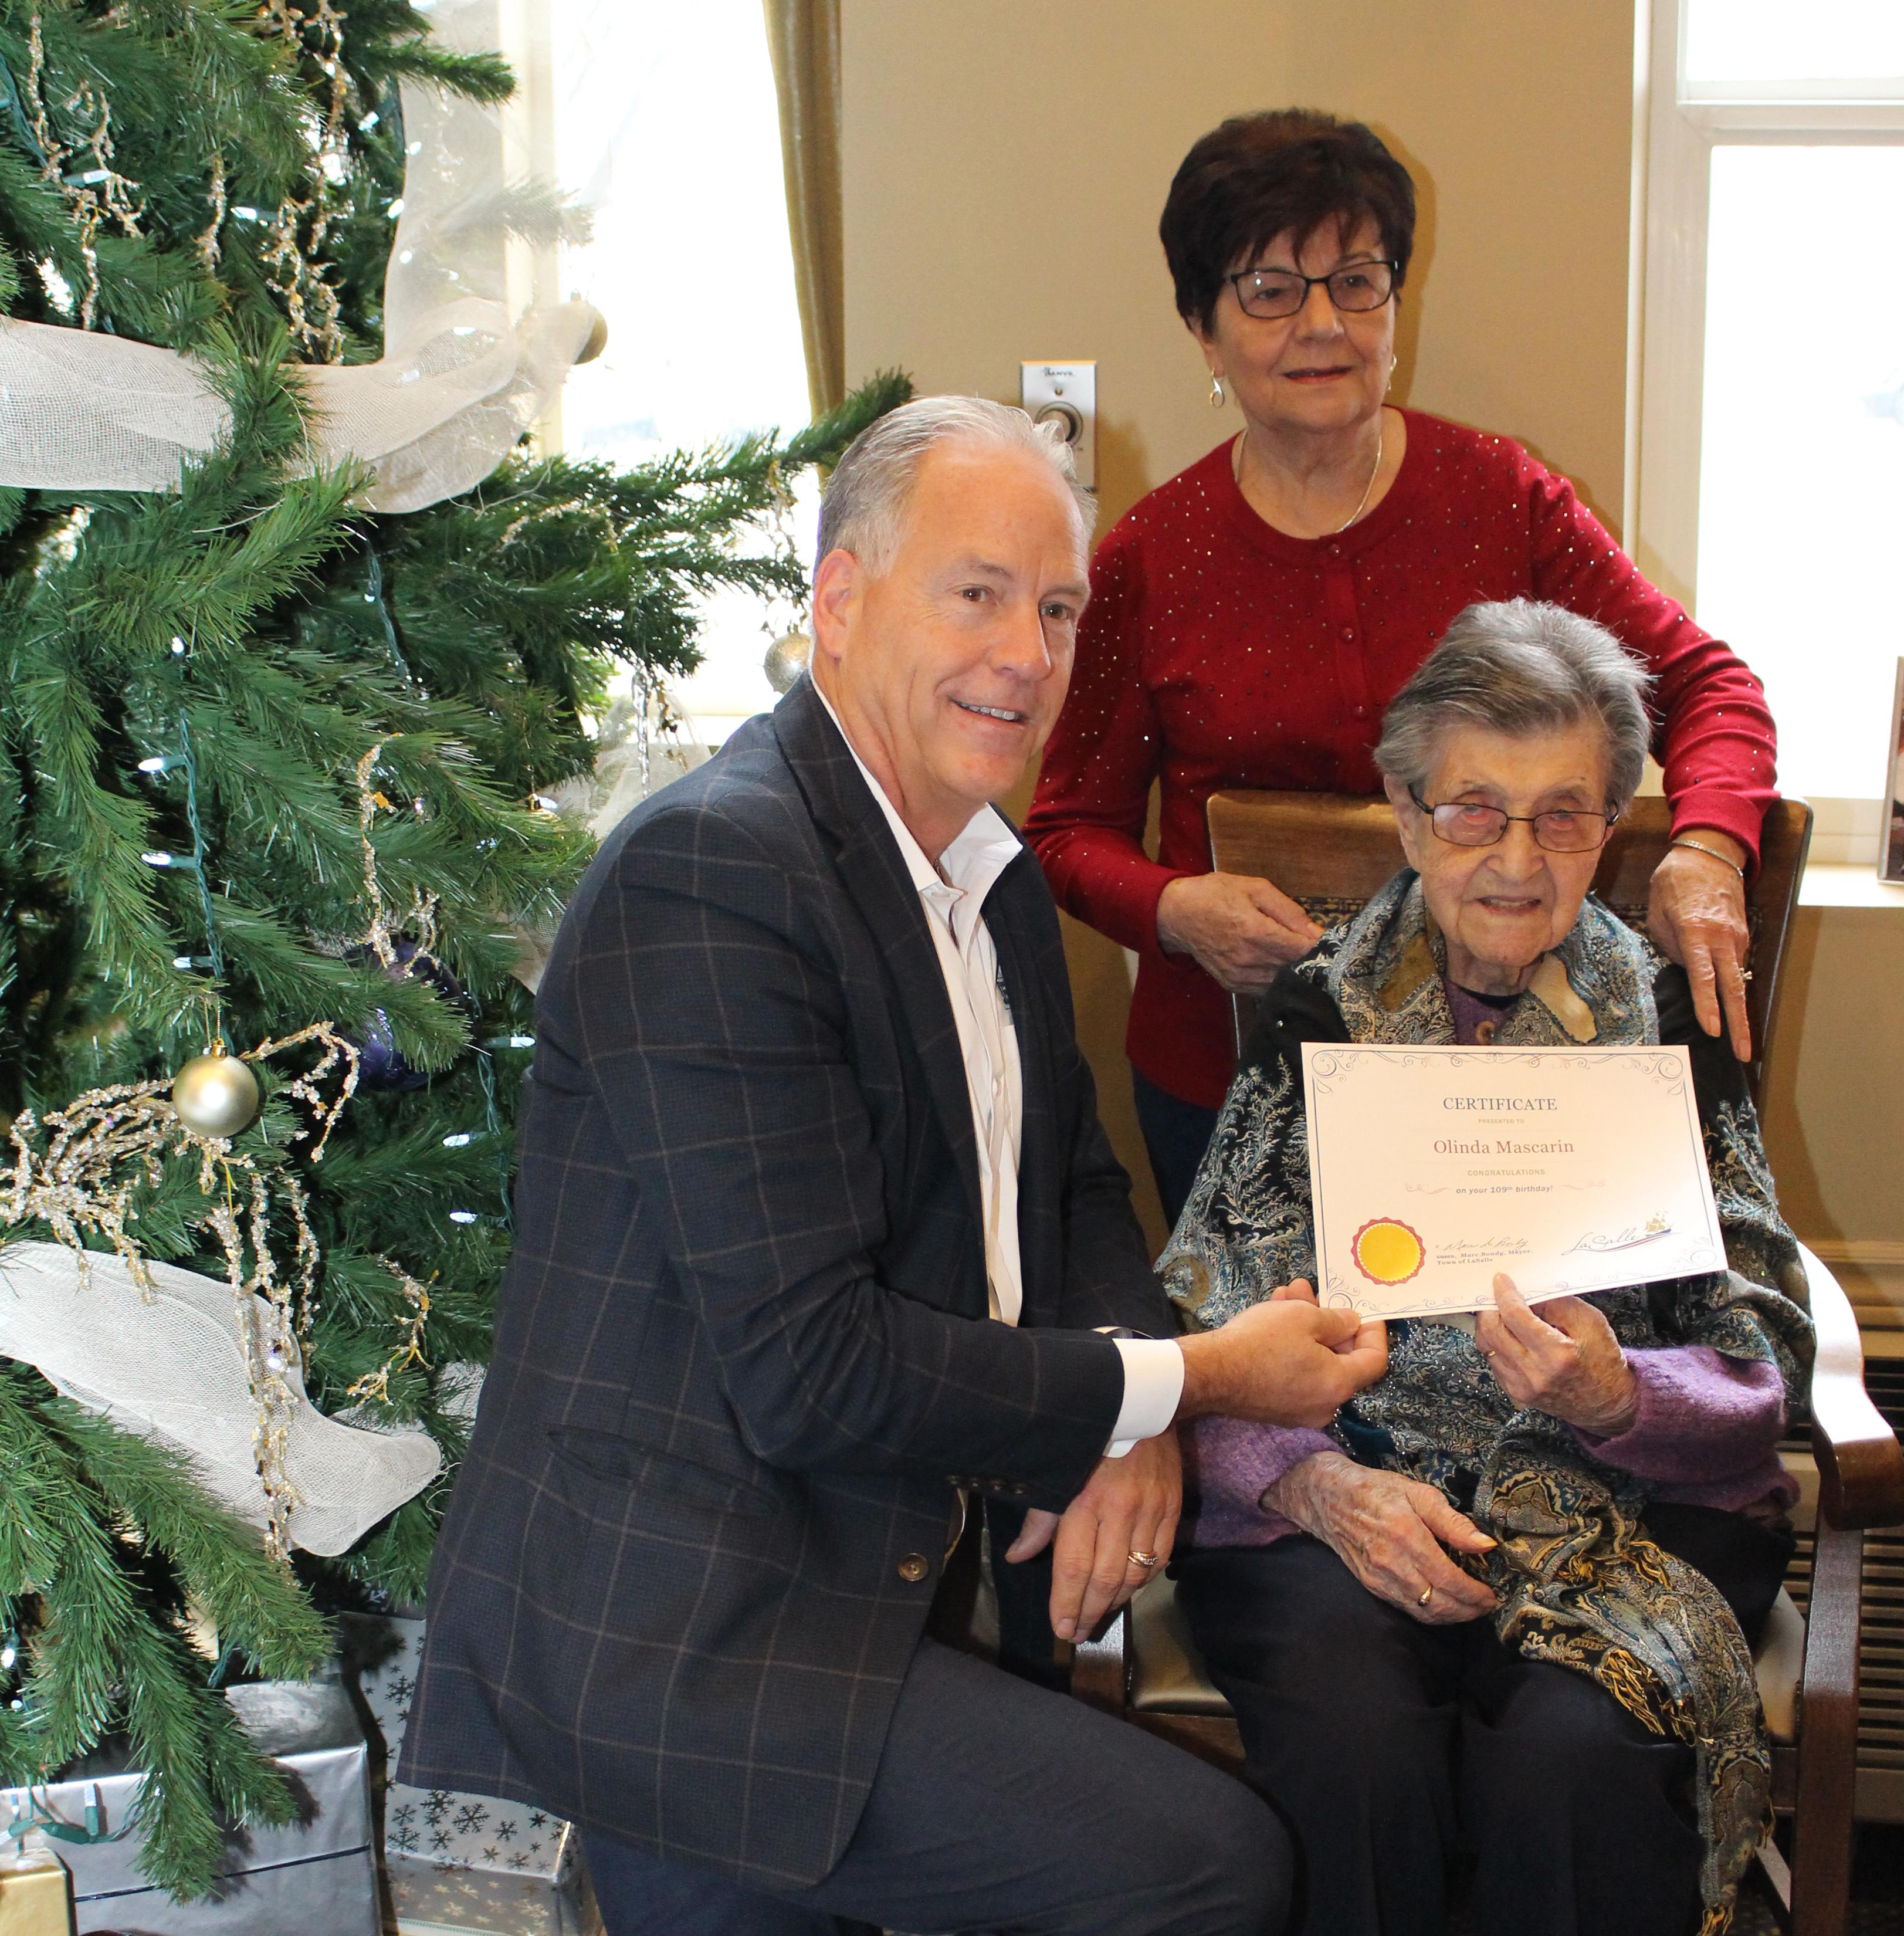 Mayor Marc Bondy wishes Olinda Mascarin a happy birthday.